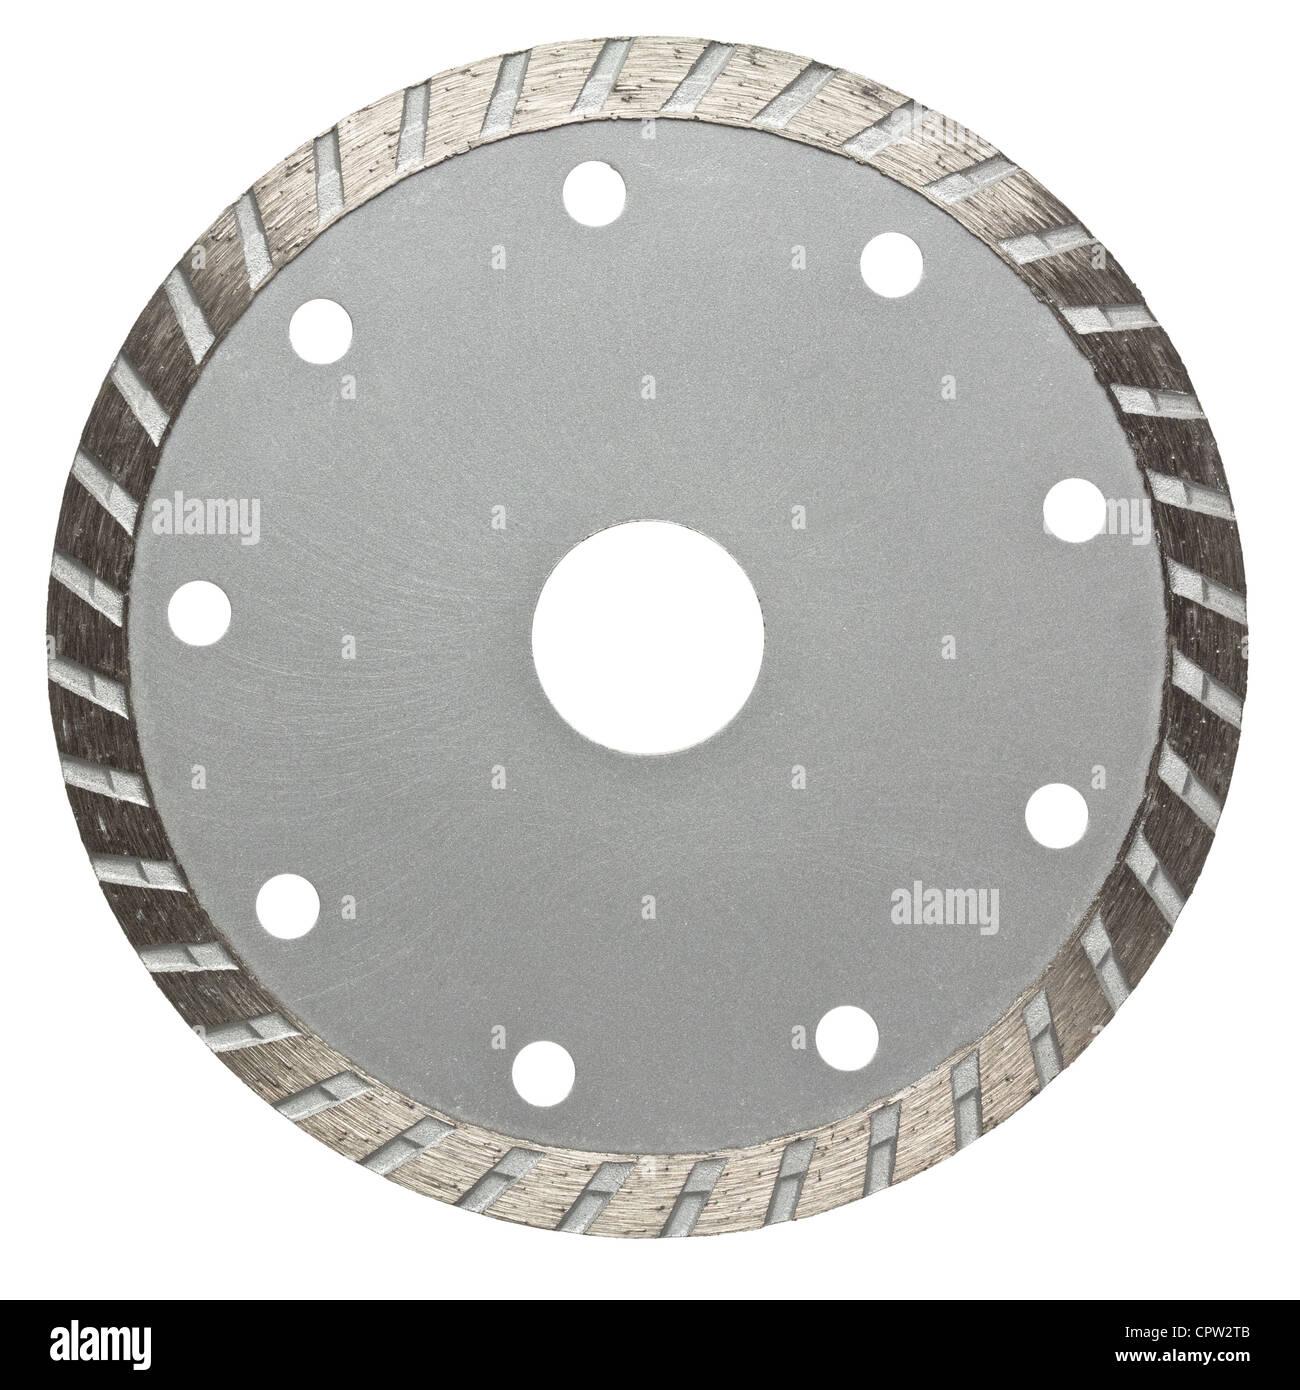 Circular saw blade. Disk for stone cutting work. - Stock Image